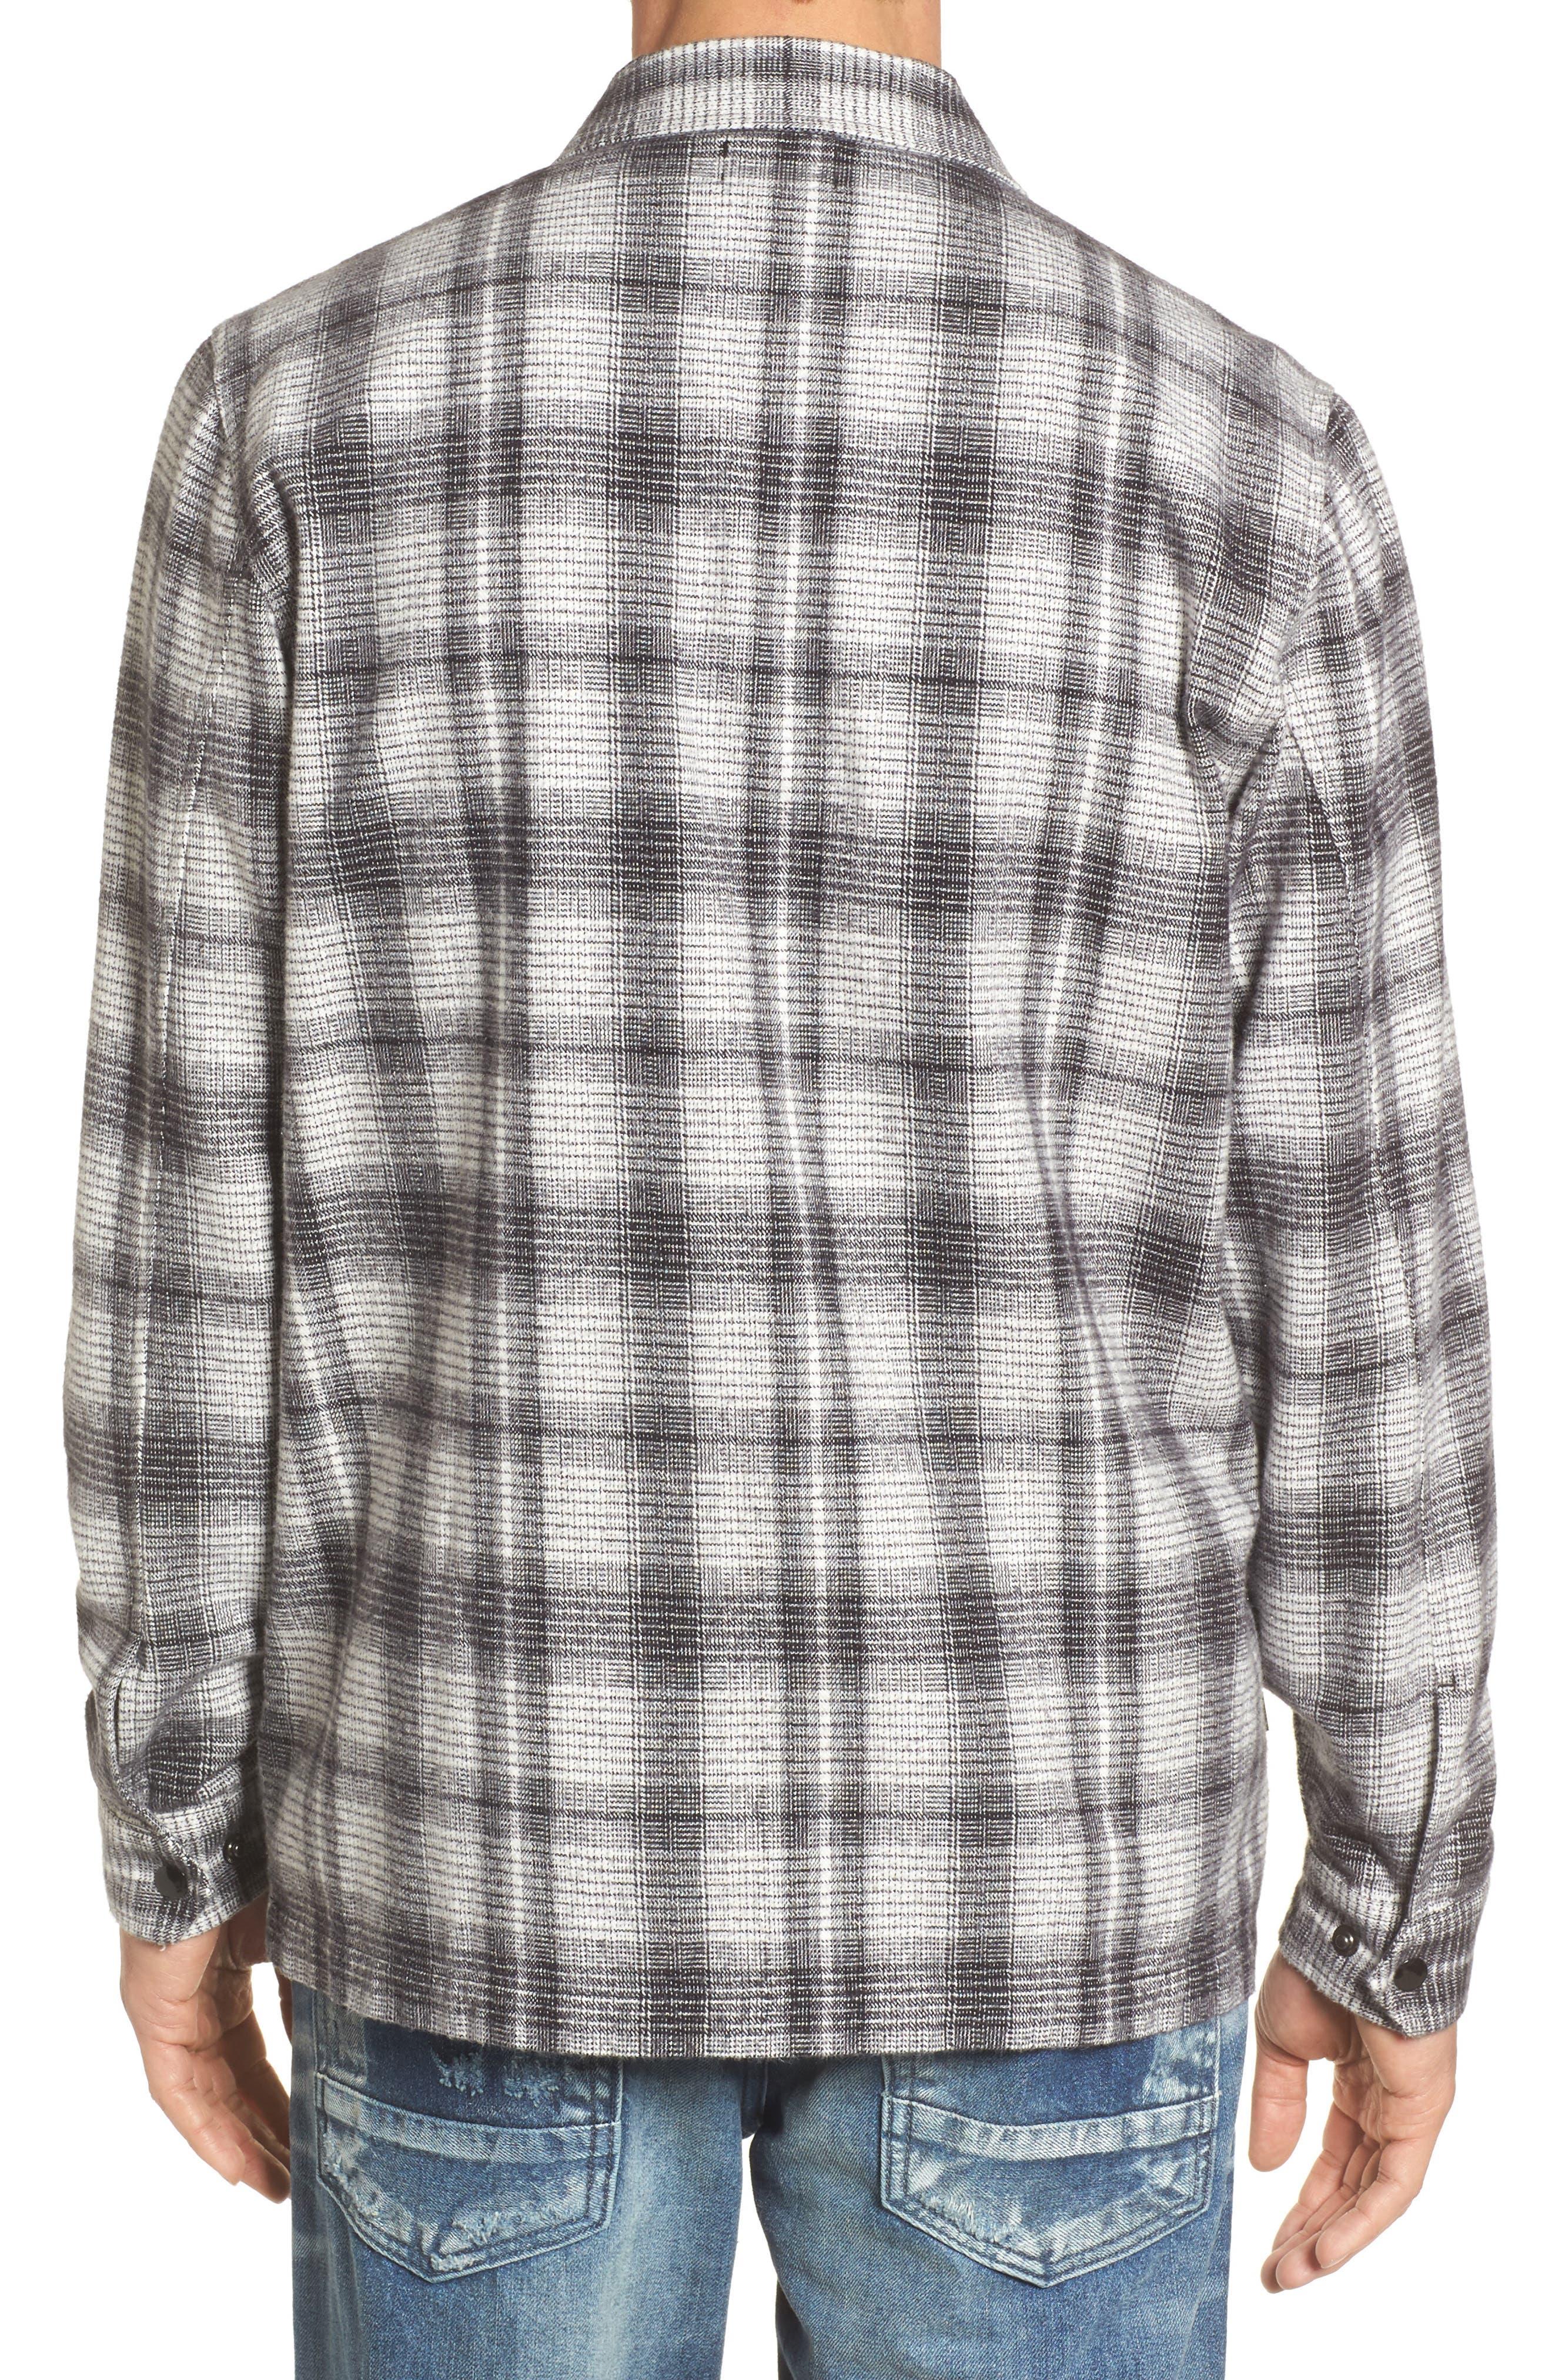 Whittier Plaid Flannel Shirt Jacket,                             Alternate thumbnail 2, color,                             Neutral Grey Multi